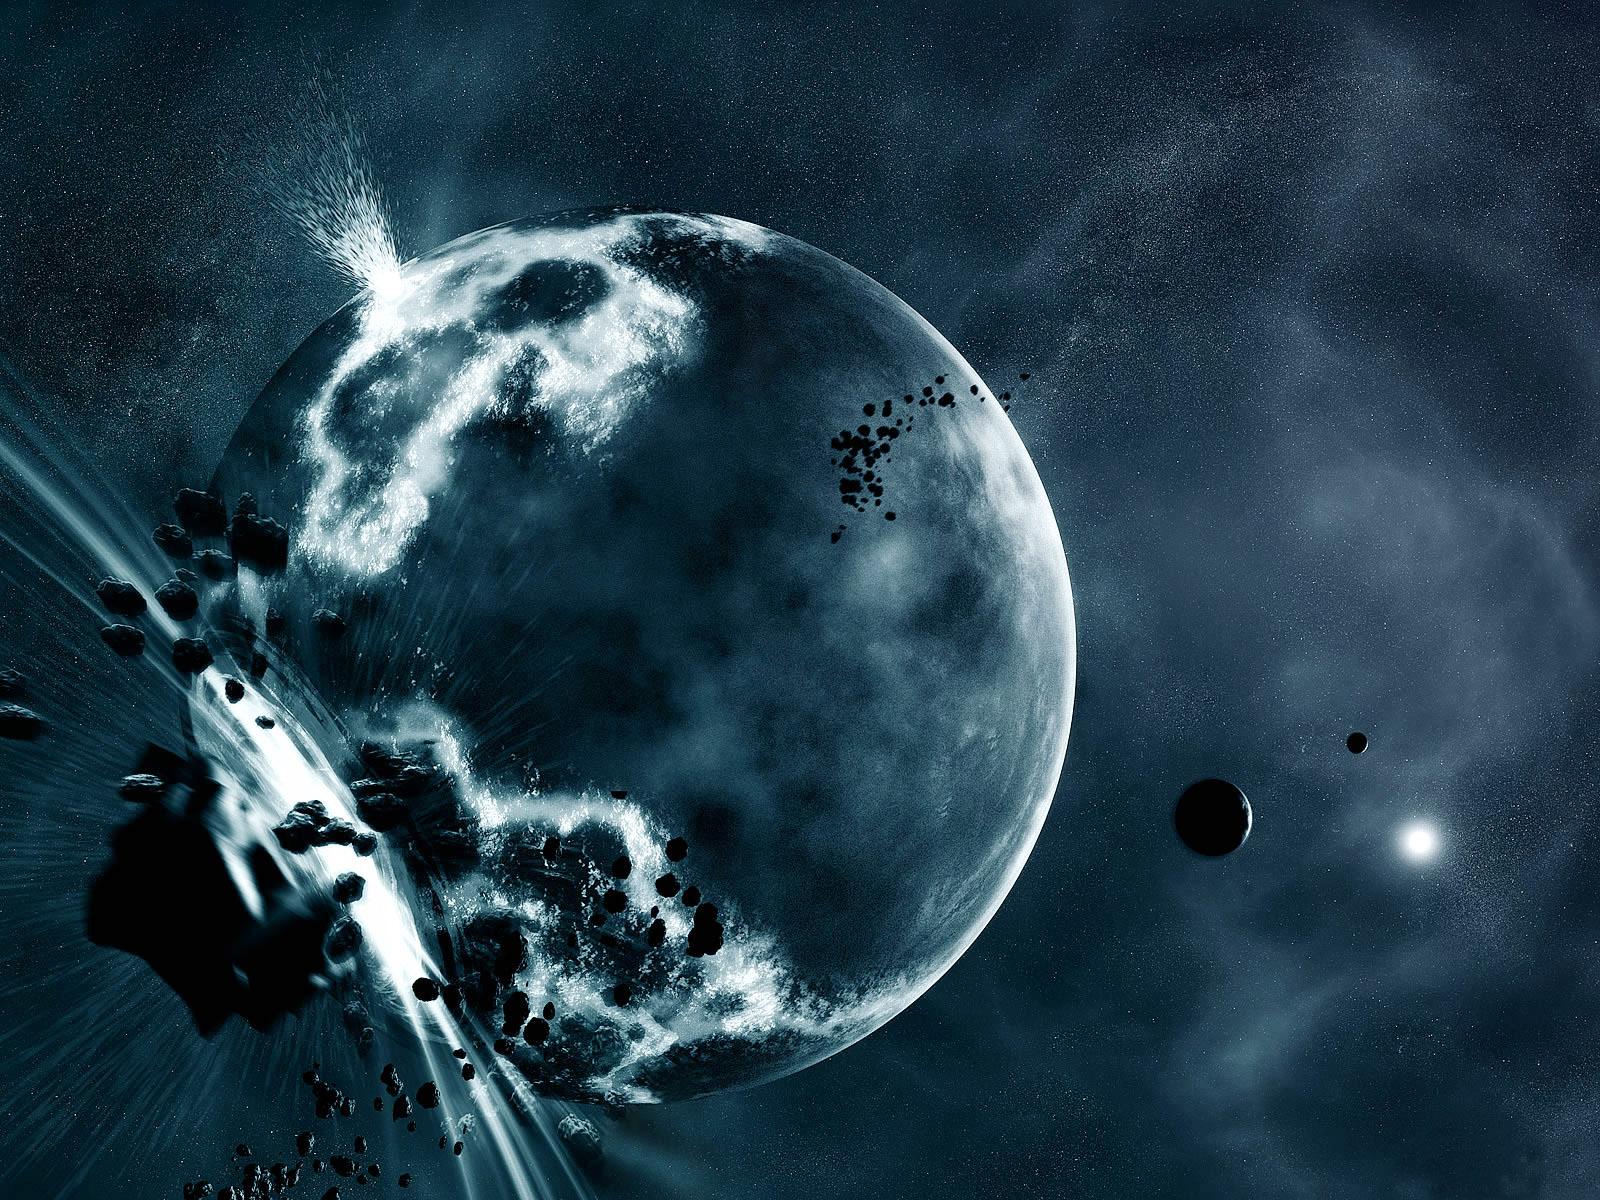 http://3.bp.blogspot.com/_NKCZzYMHISE/S_gjnbWzVrI/AAAAAAAAAbs/RmahMXYUlx8/s1600/space-art-wallpaper.jpg